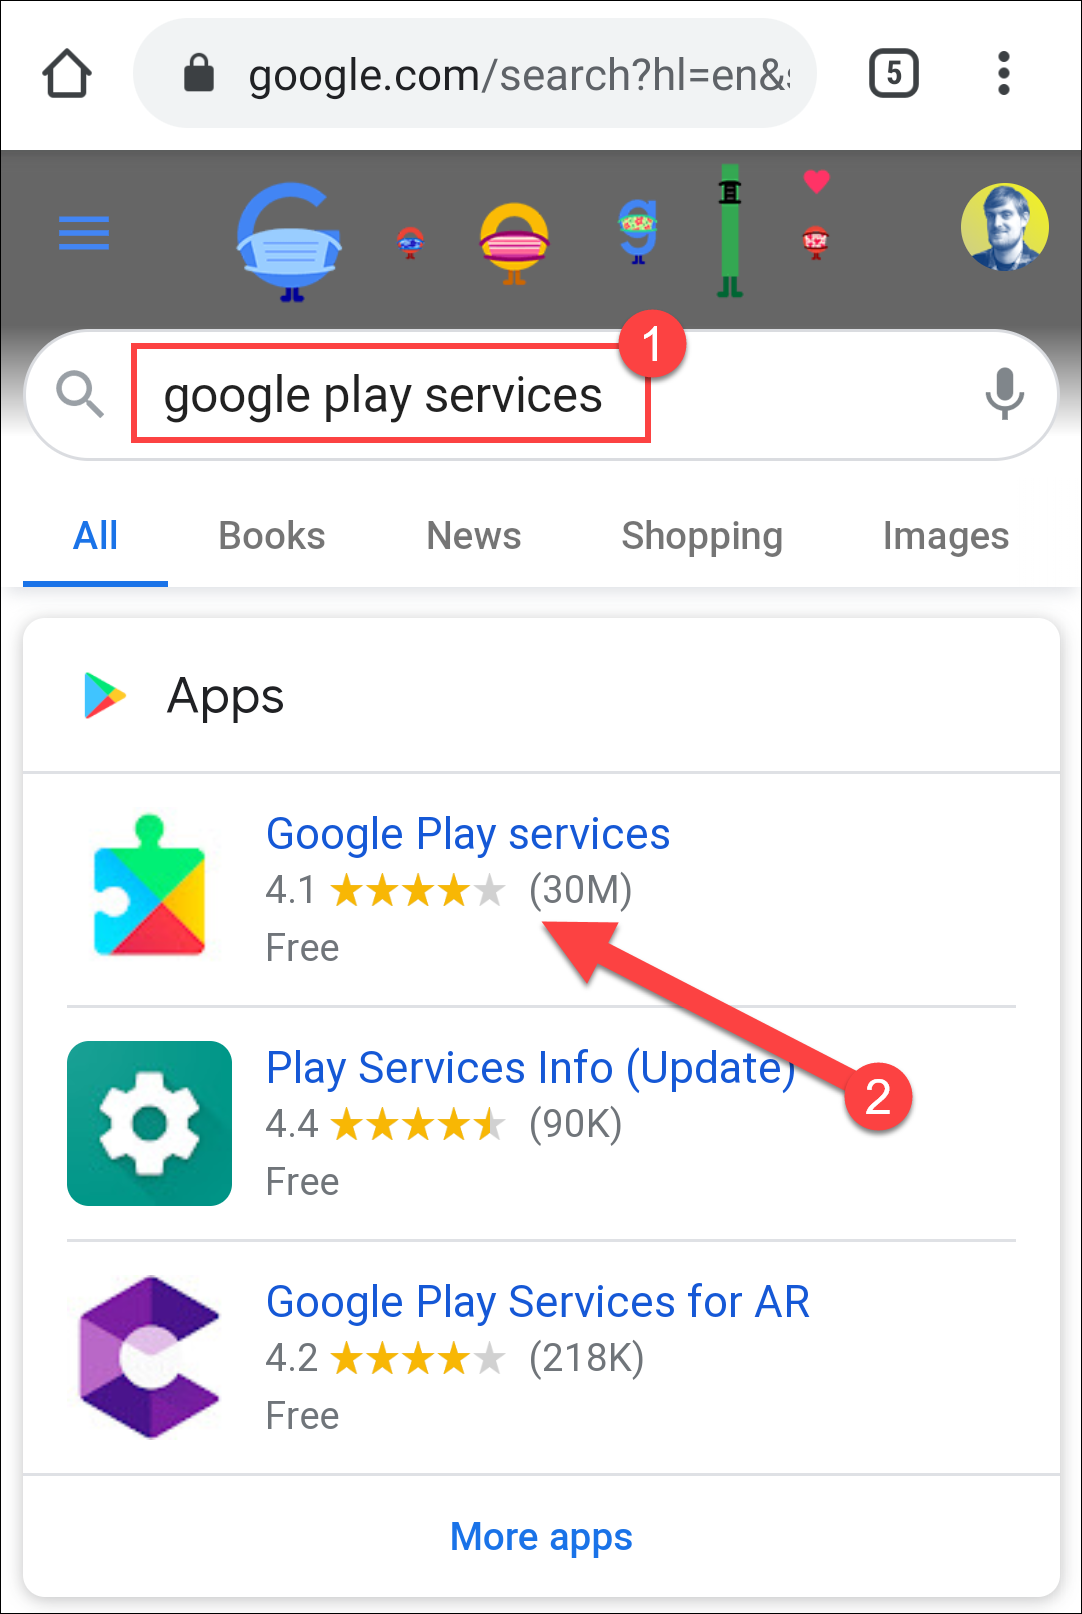 recherche de services google play